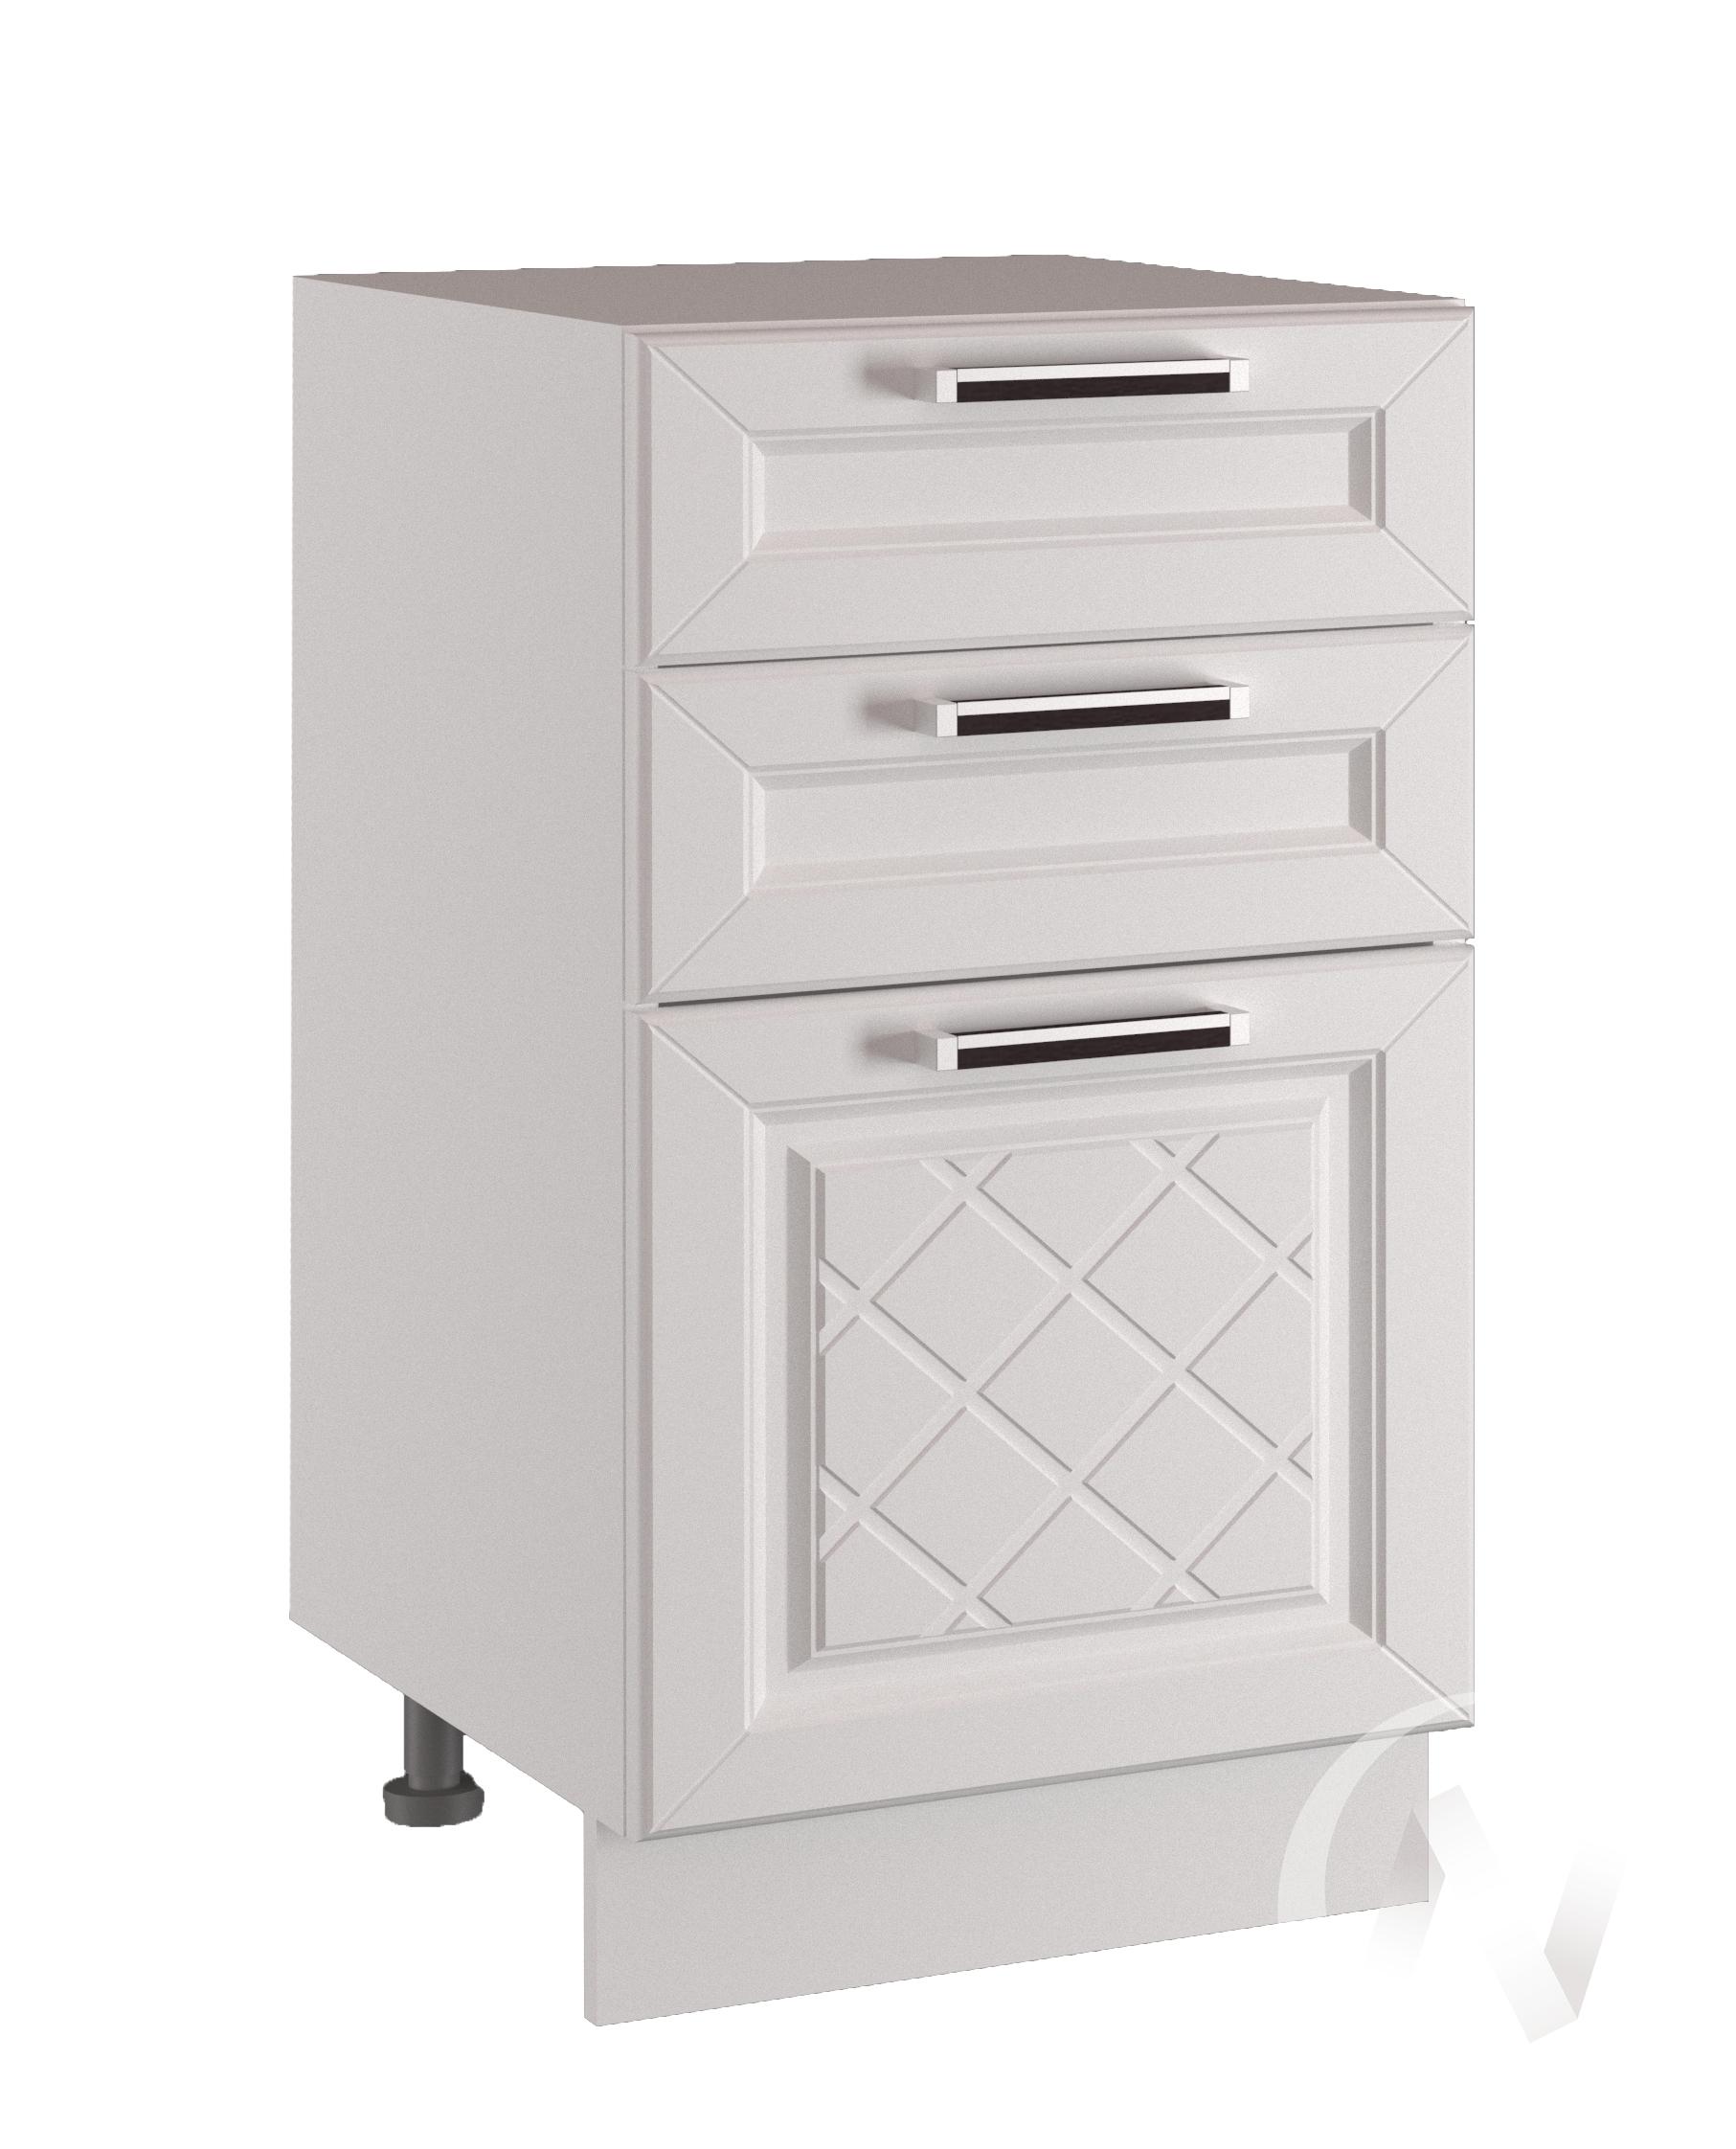 "Кухня ""Вена"": Шкаф нижний с 3-мя ящиками 600, ШН3Я 600 (корпус белый)"